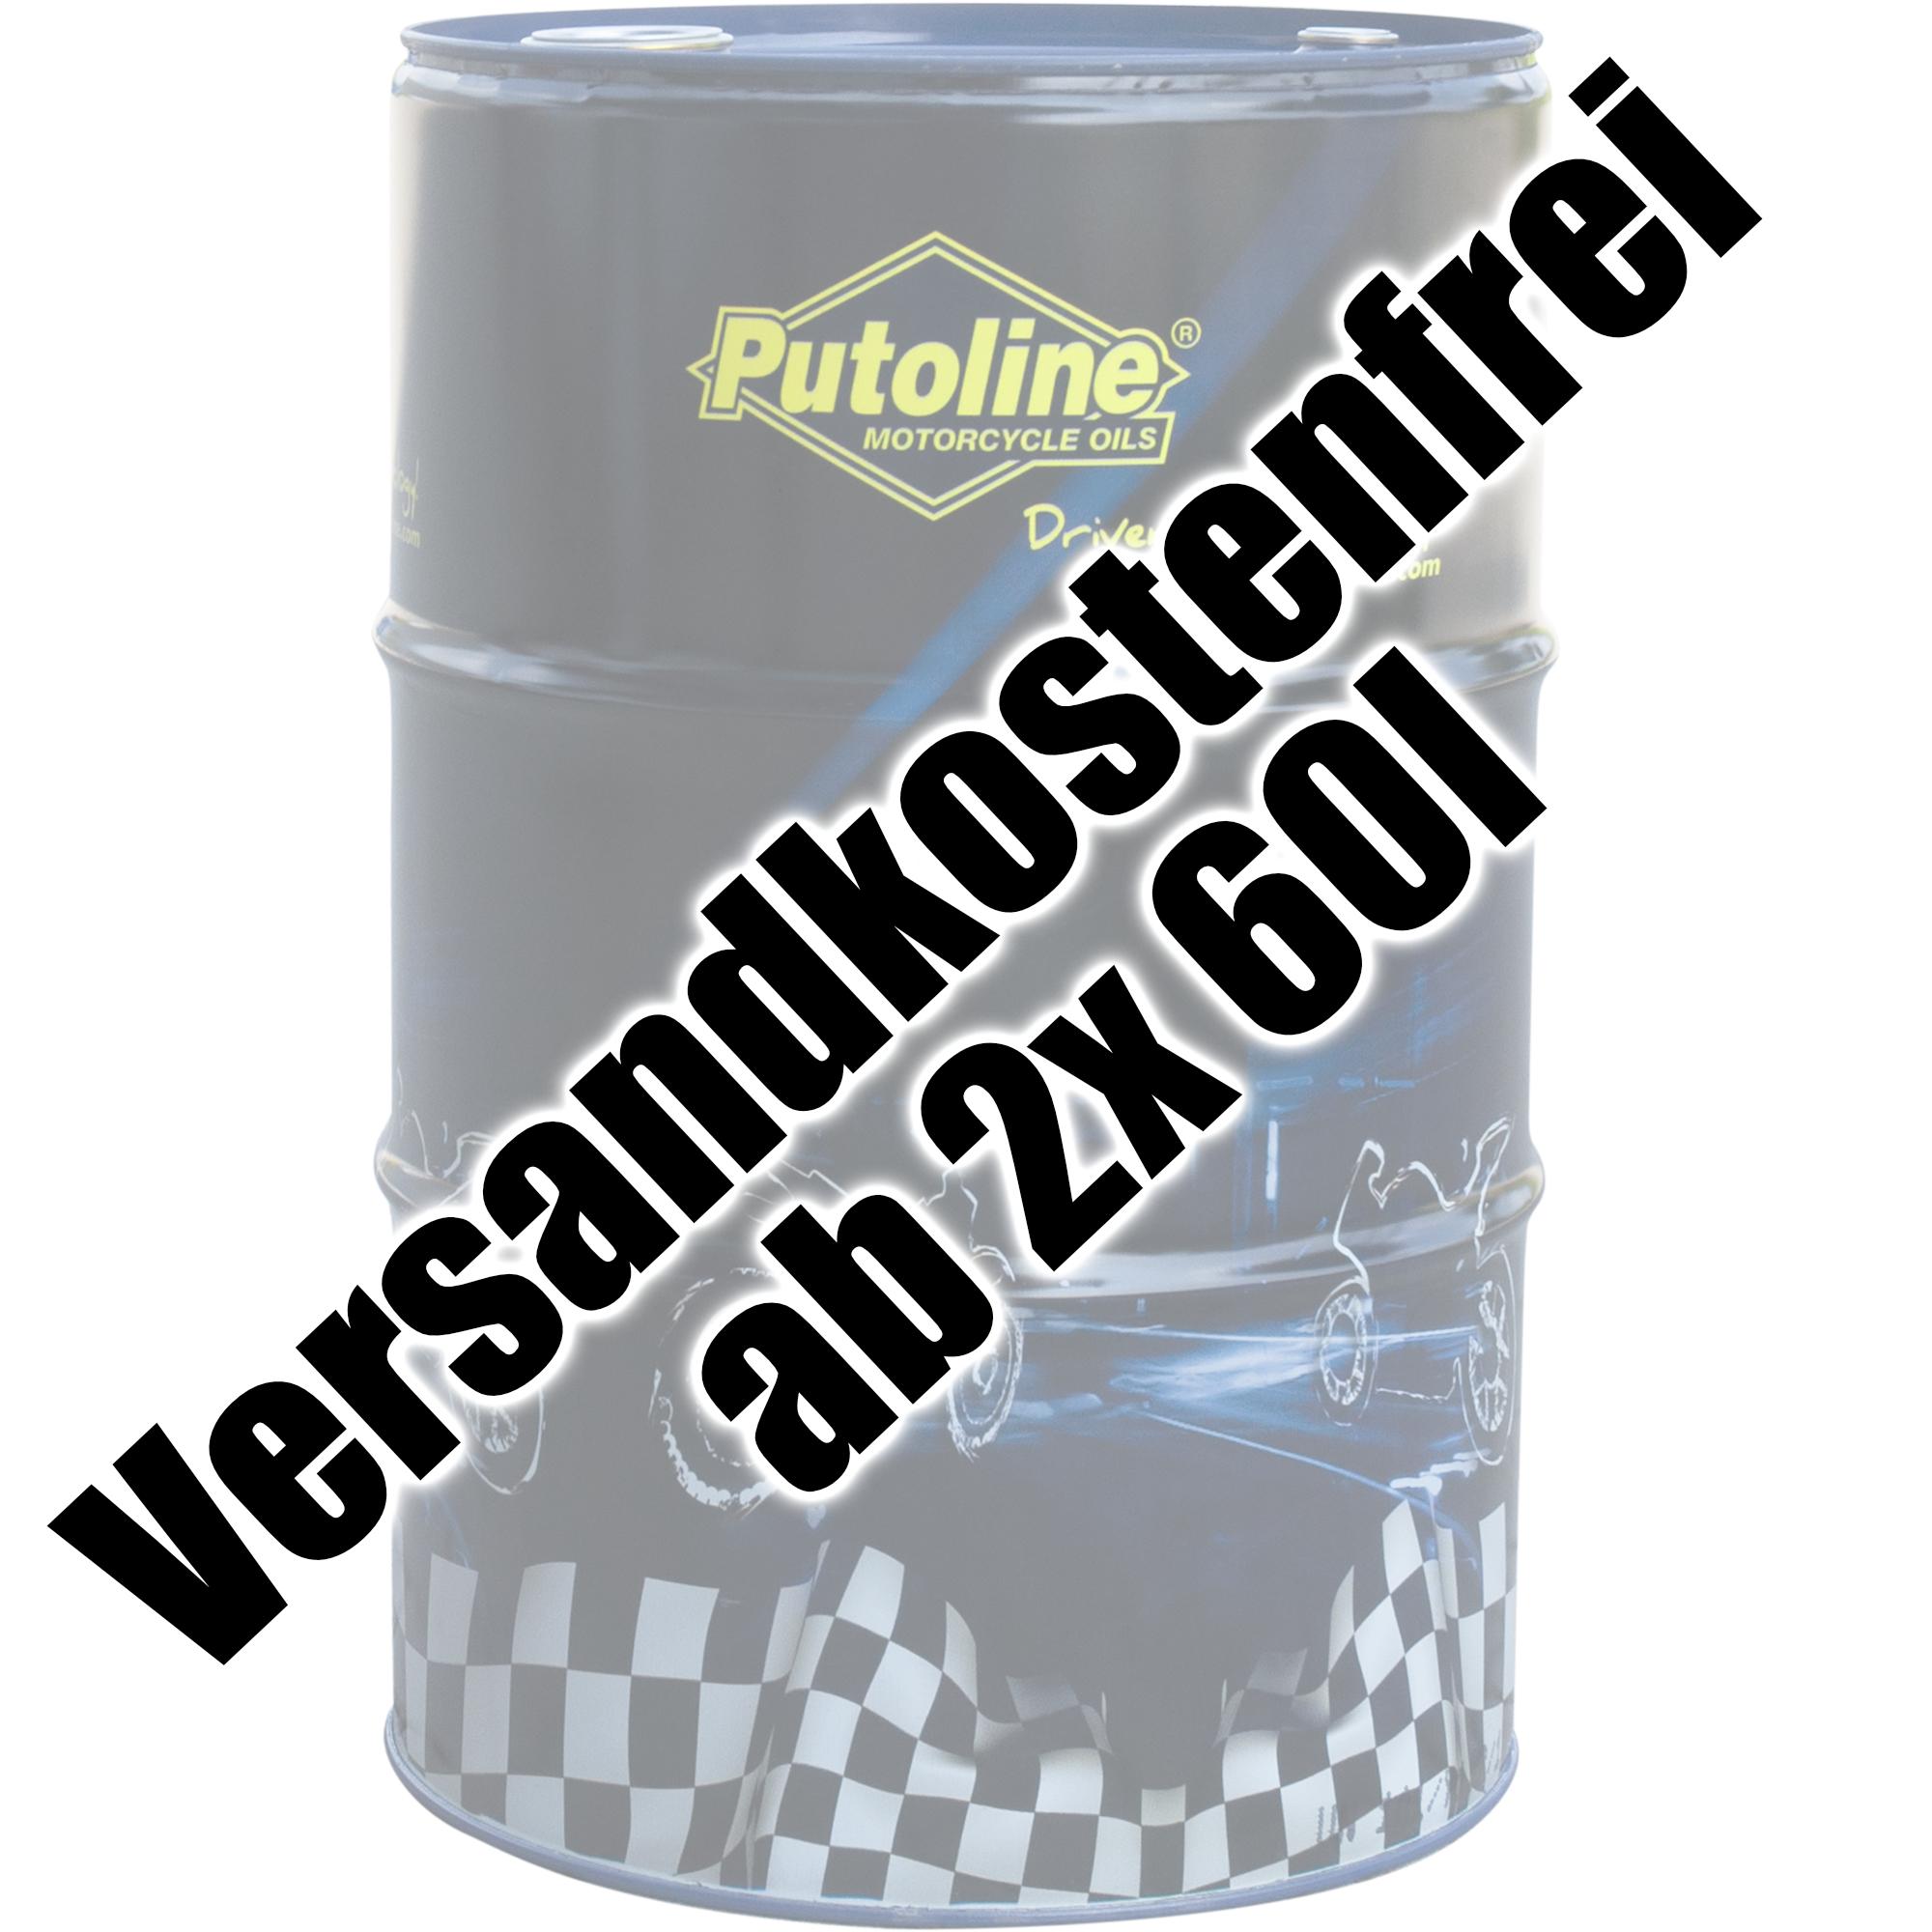 Putoline Motoröl EsterTech Syntec 4+ 10W-40 60L